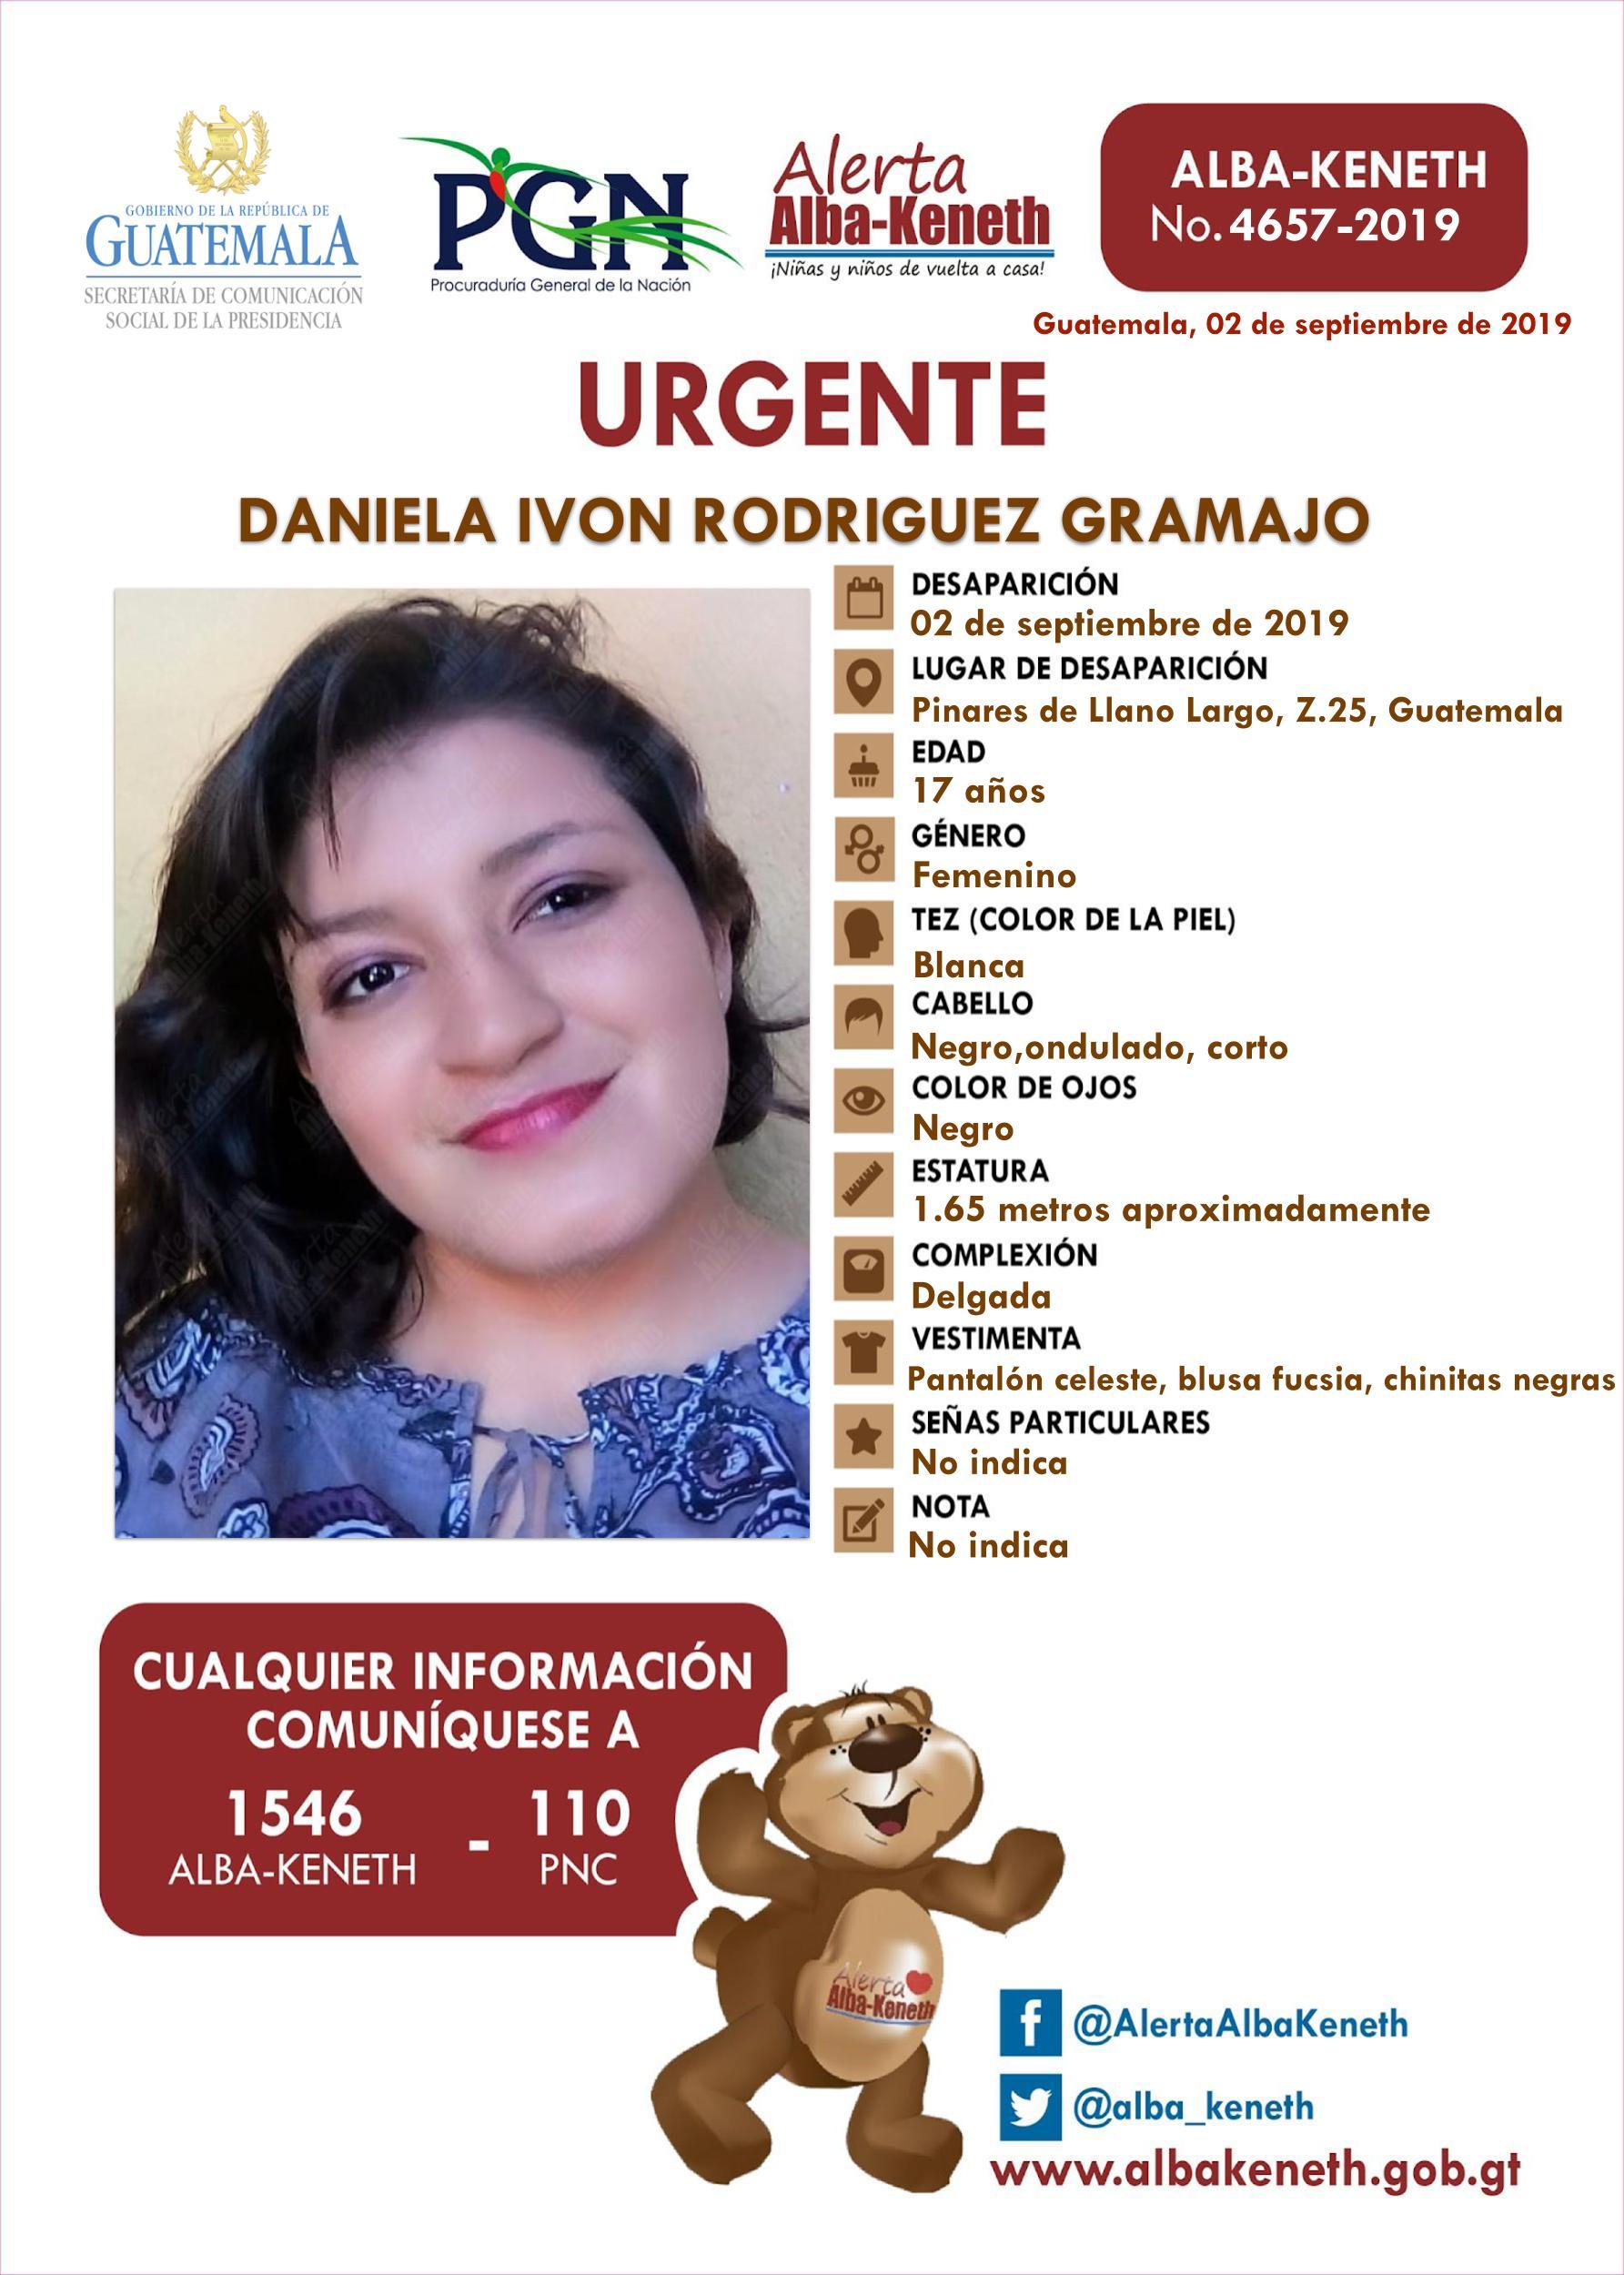 Daniela Ivon Rodriguez Gramajo